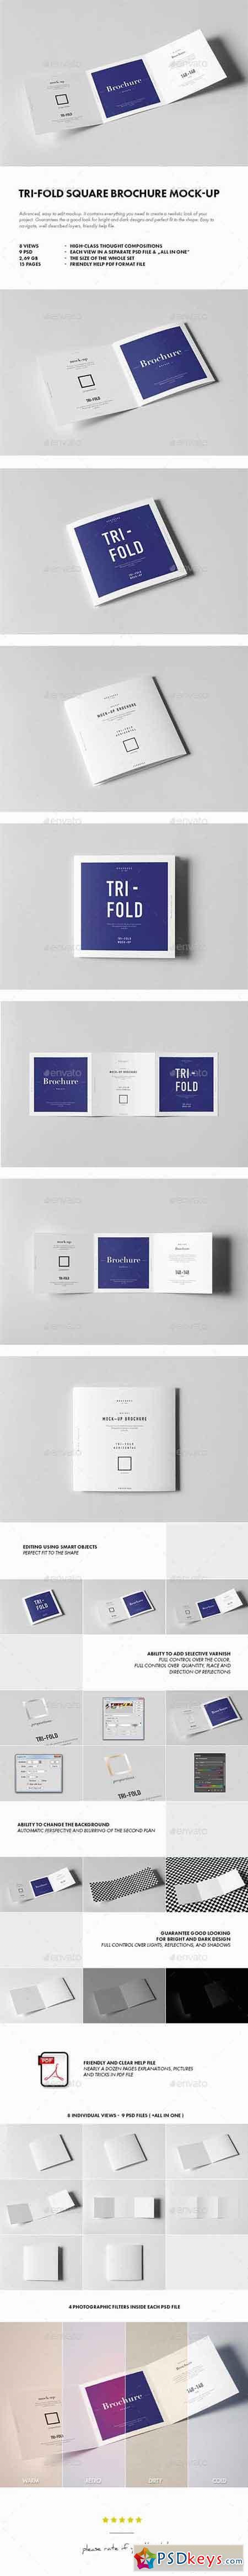 Tri-Fold Square Brochure Mock-up 18126309